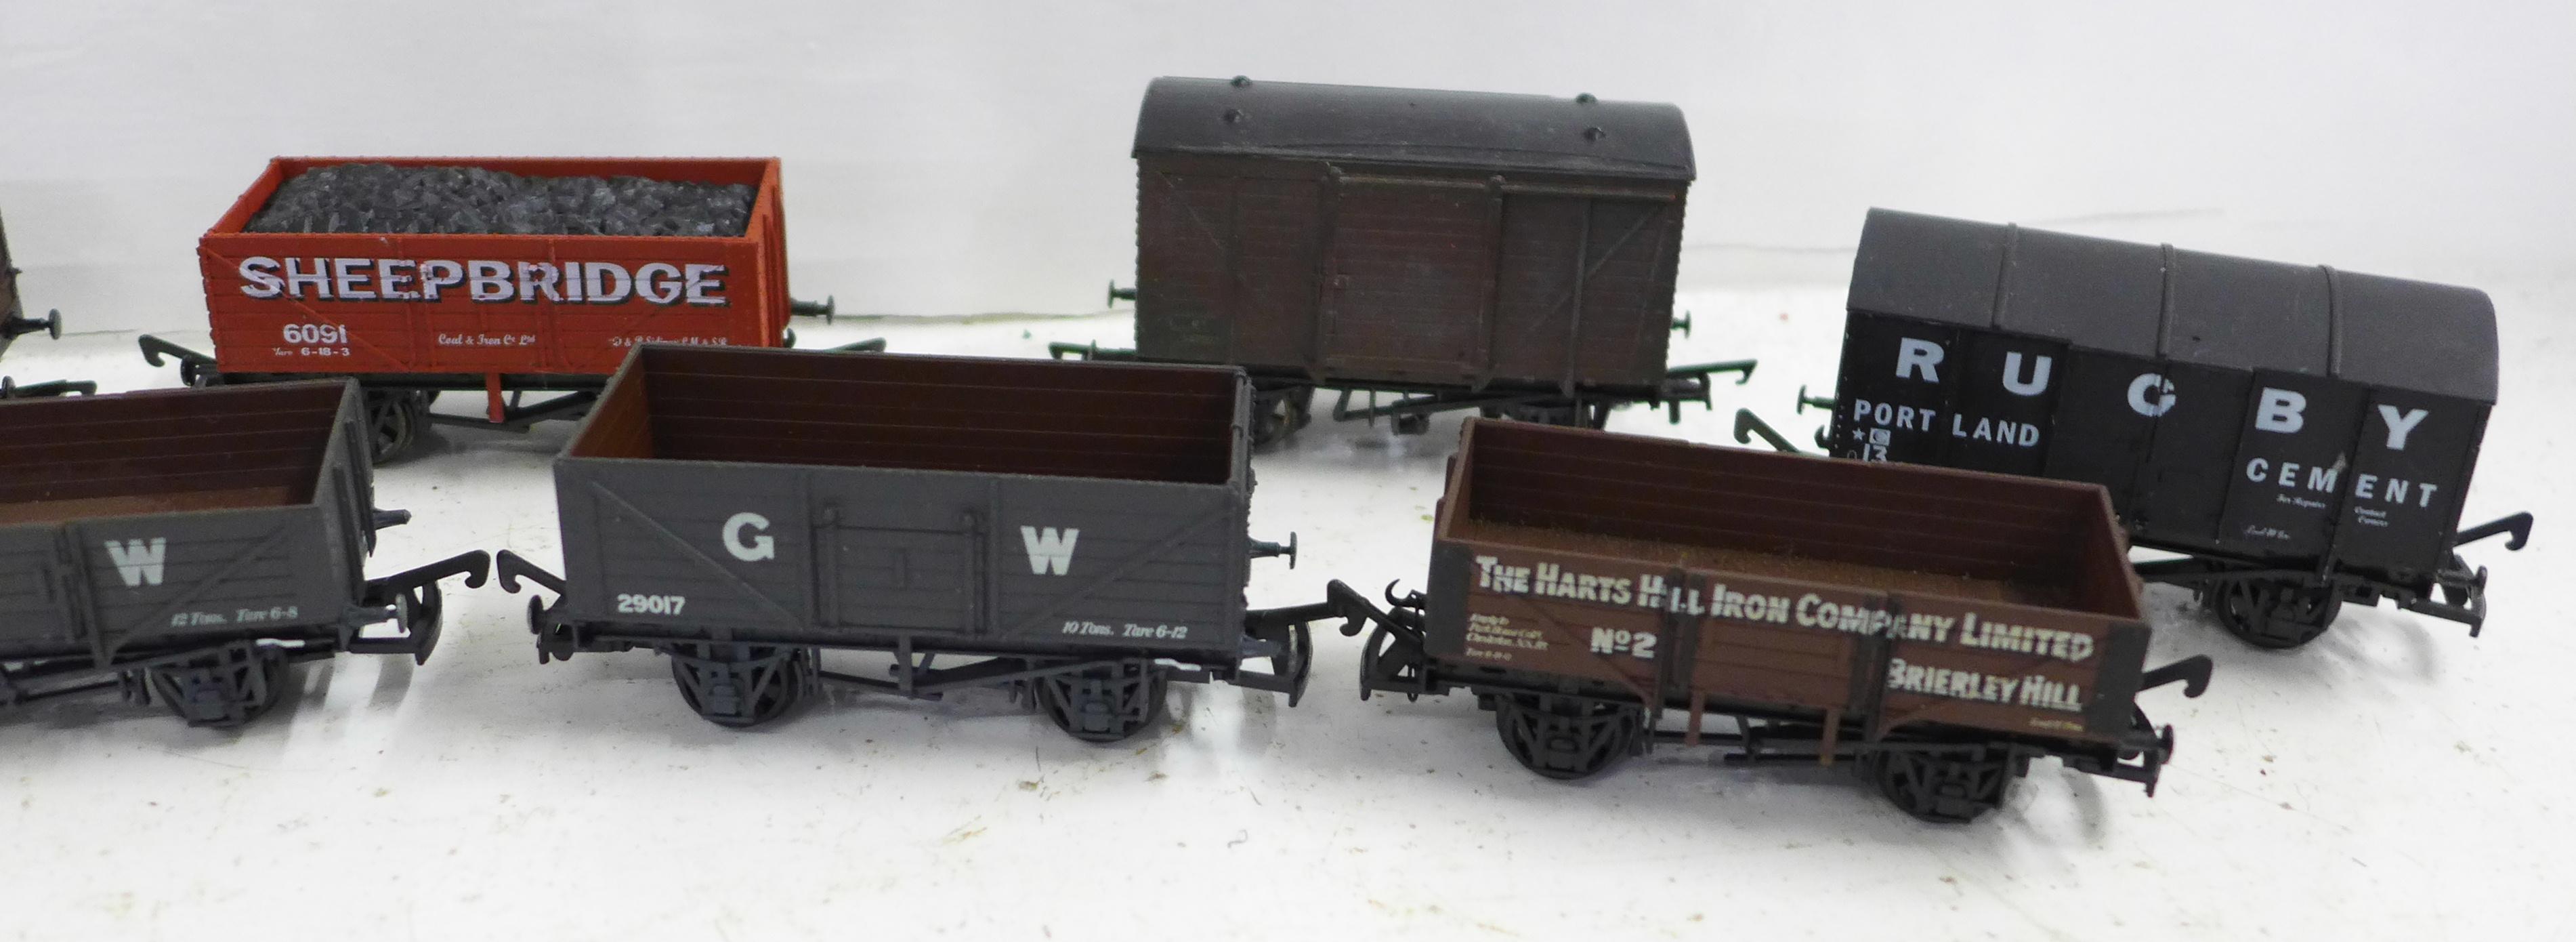 Ten OO gauge model railway wagons including Airfix and Dapol - Image 3 of 3